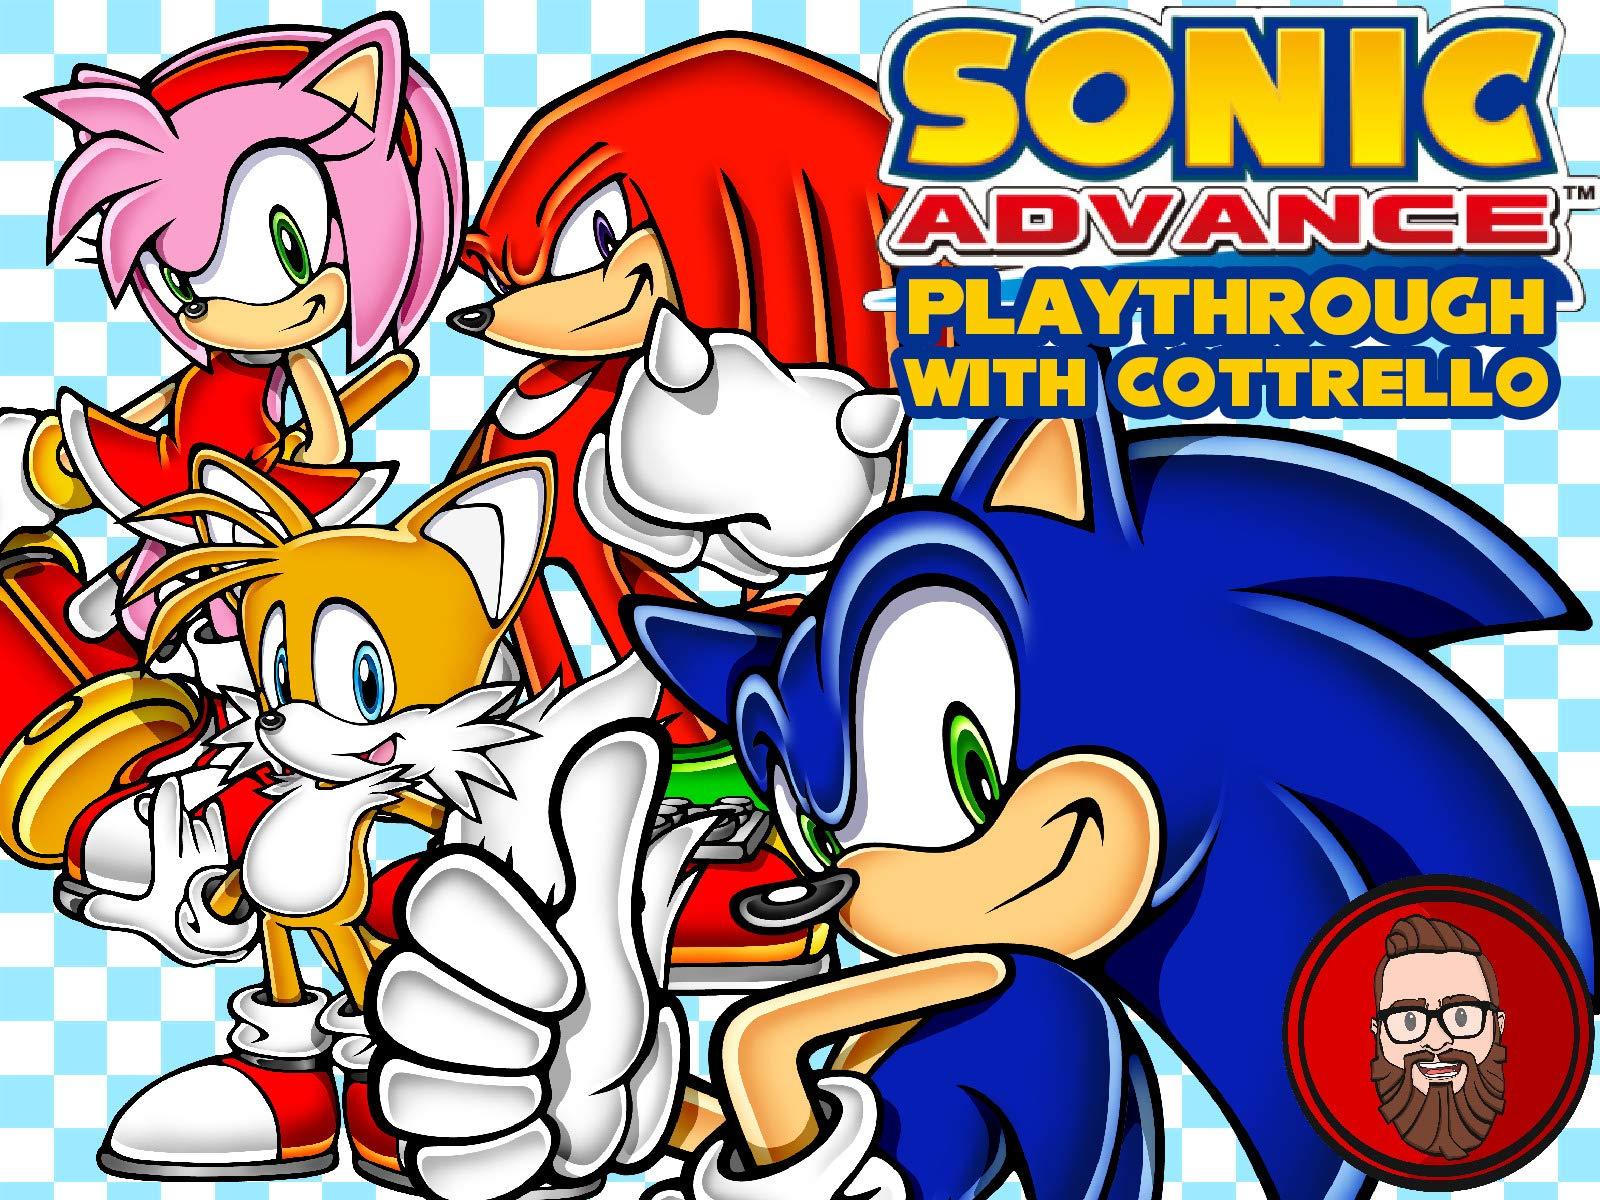 Watch Sonic Advance Playthrough With Cottrello On Amazon Prime Video Uk Newonamzprimeuk